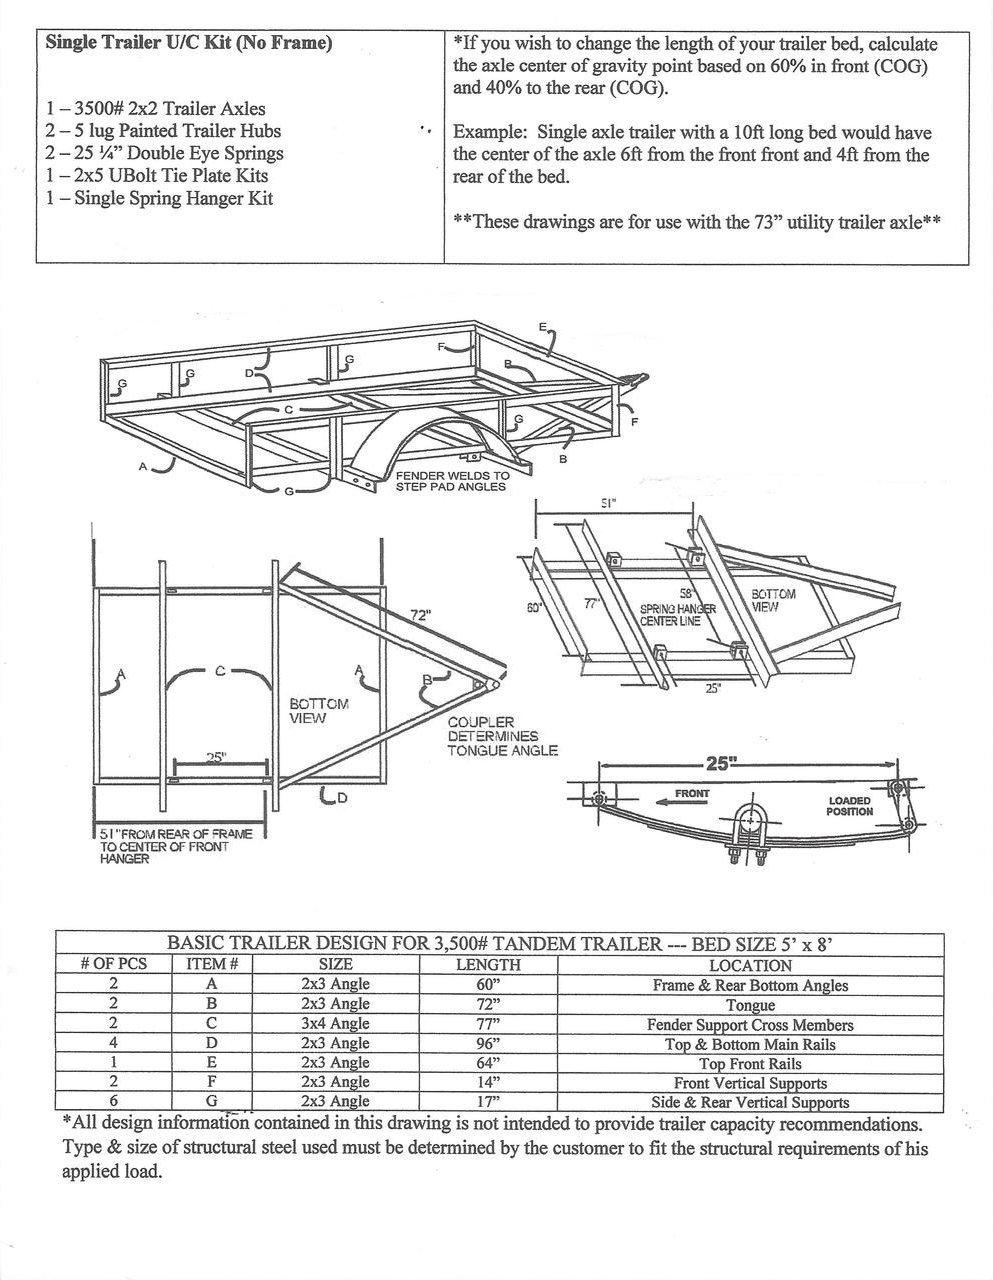 3500-single-undercarriage-trailer-kit.jpg